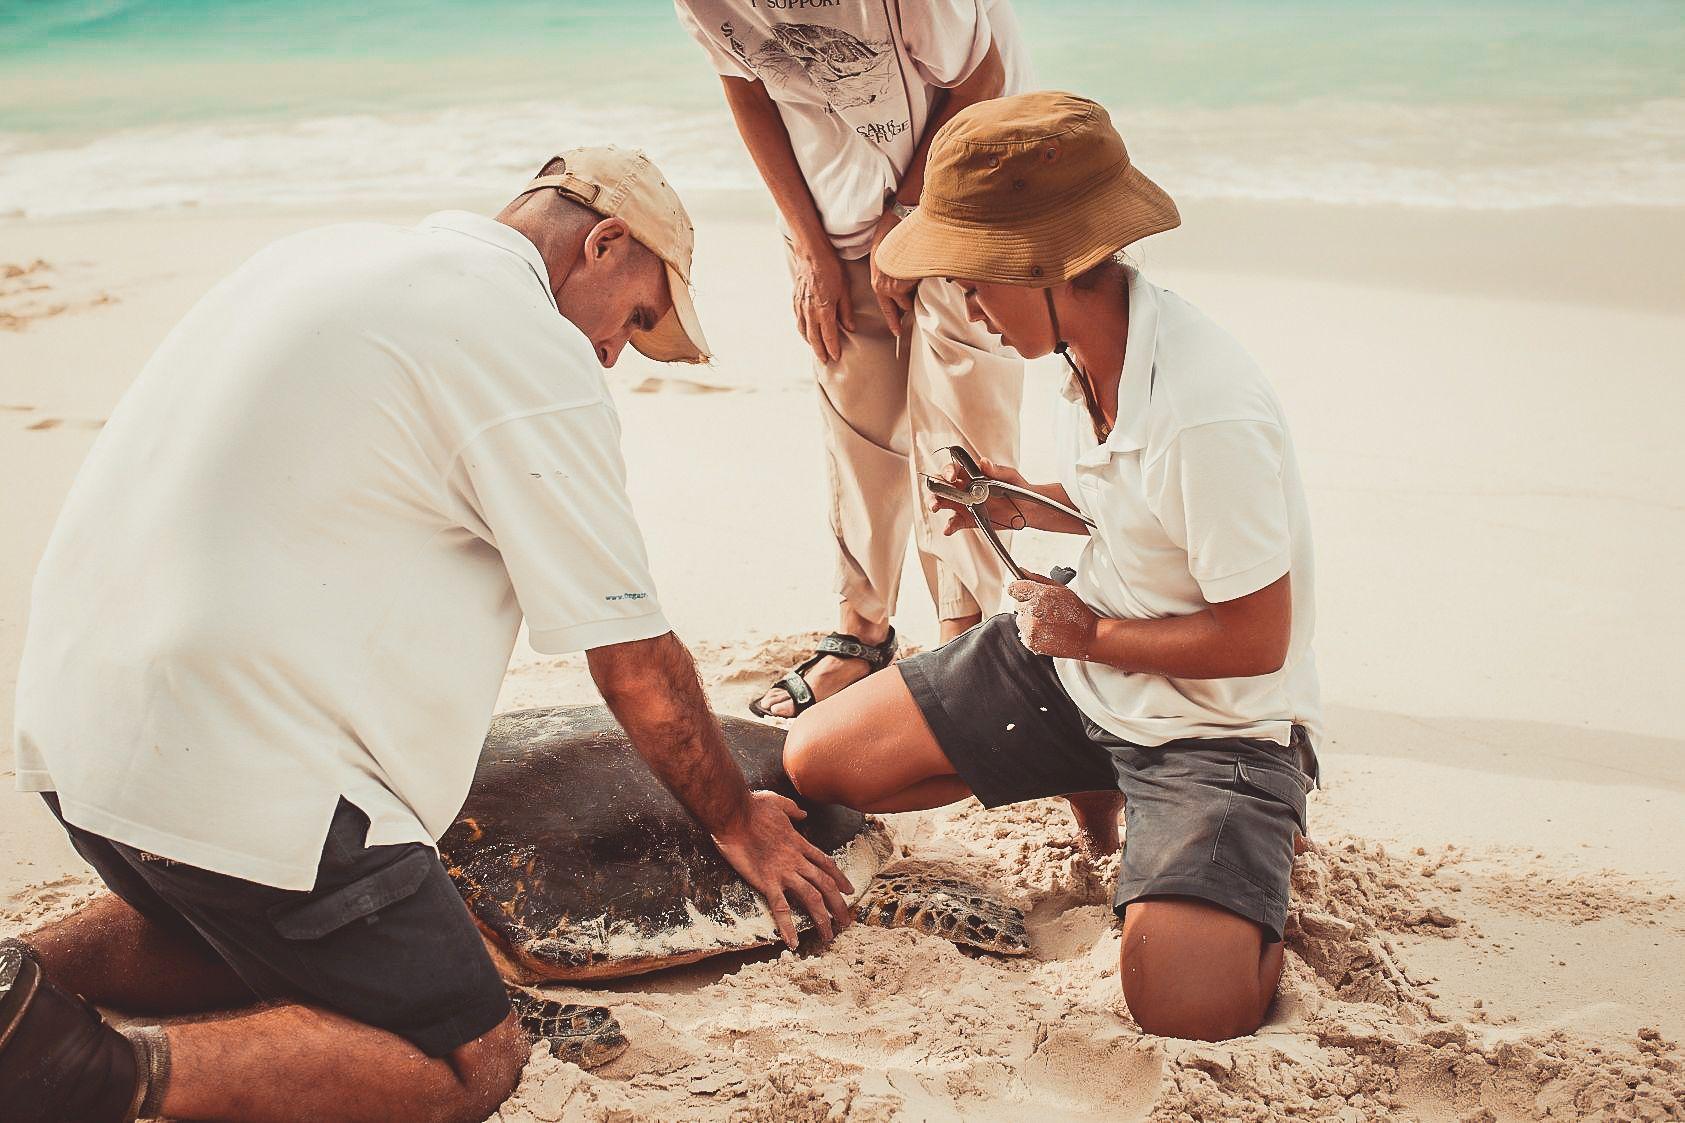 Strand Conservation